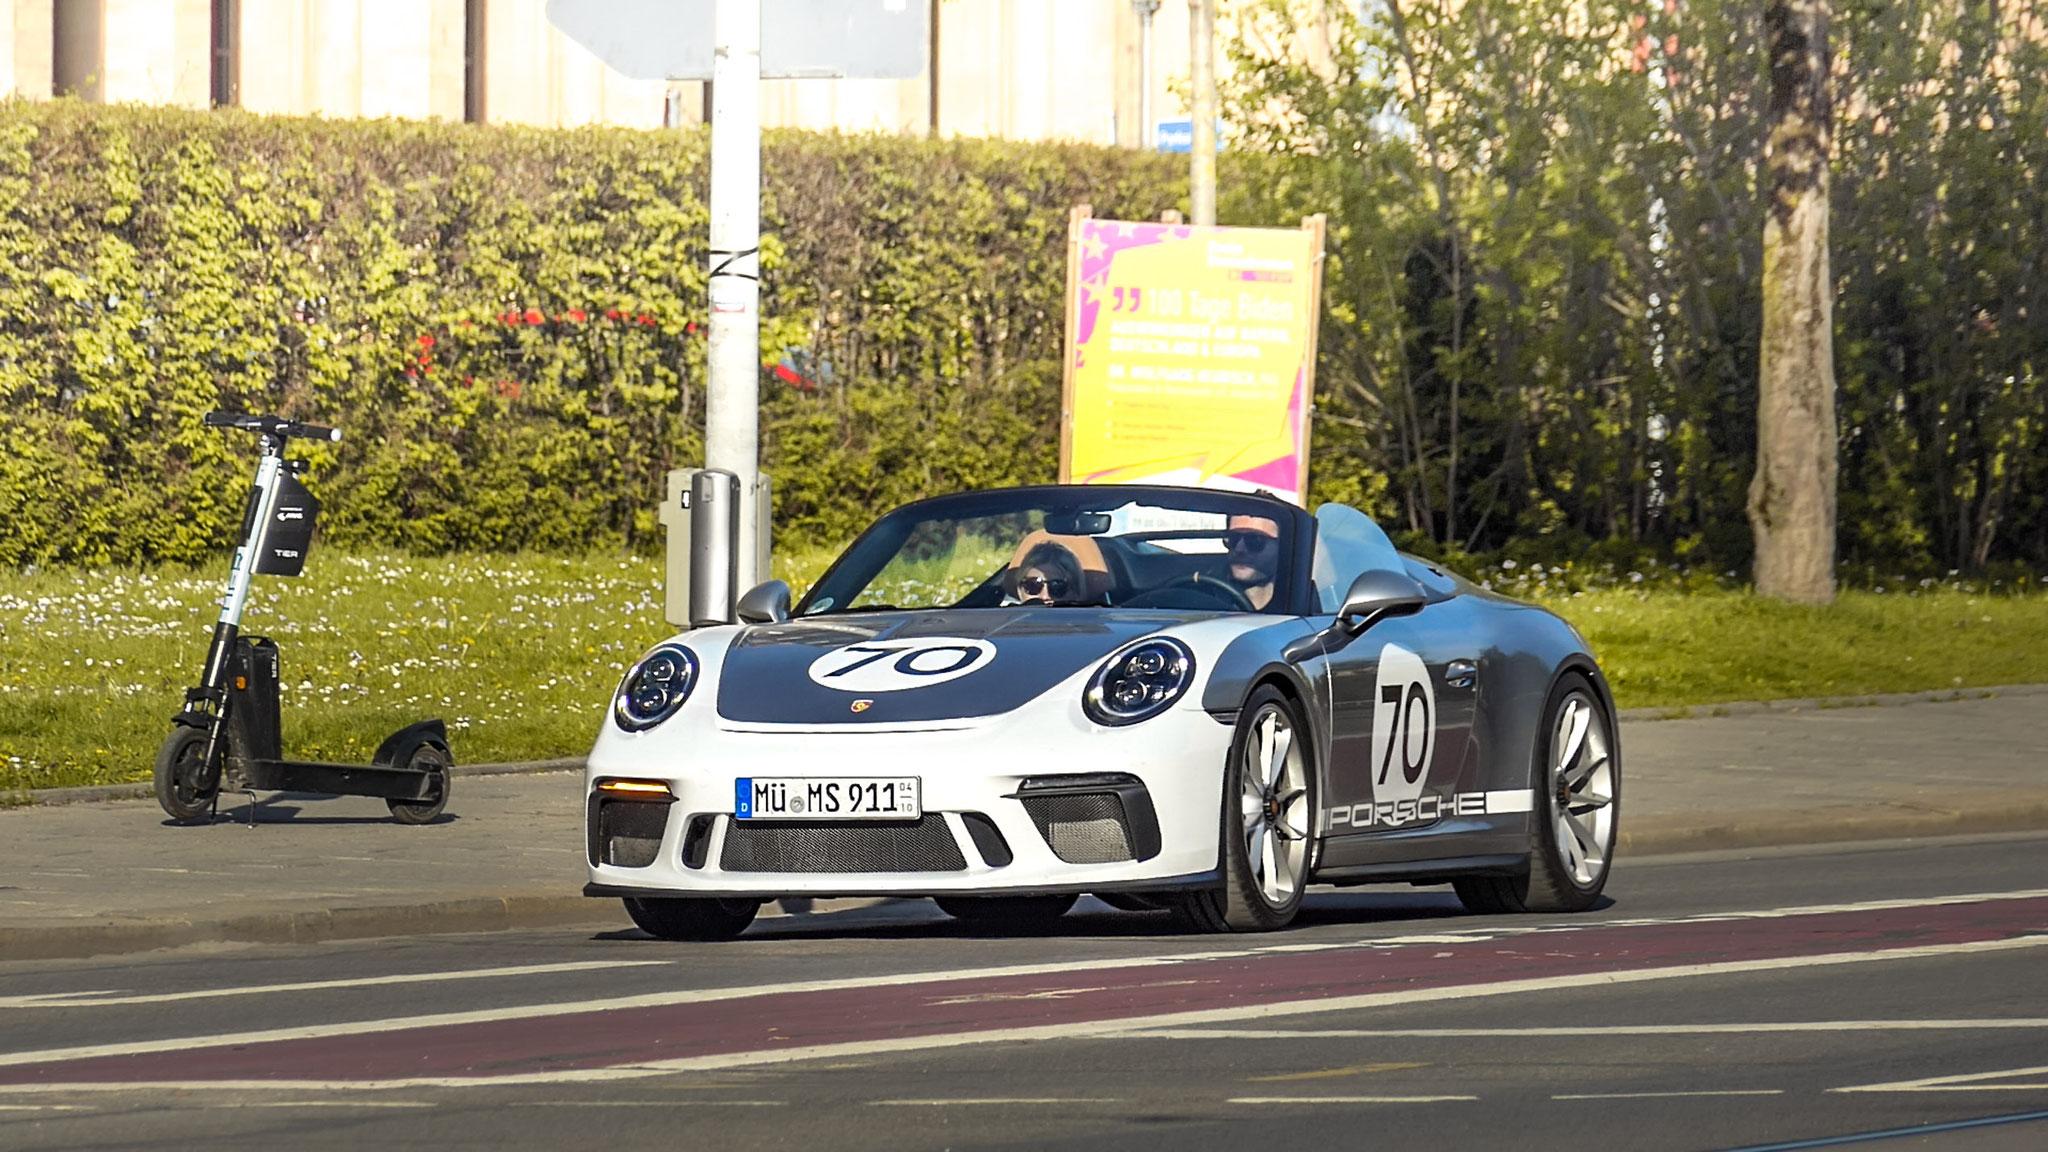 Porsche 991 Speedster - MÜ-MS-911